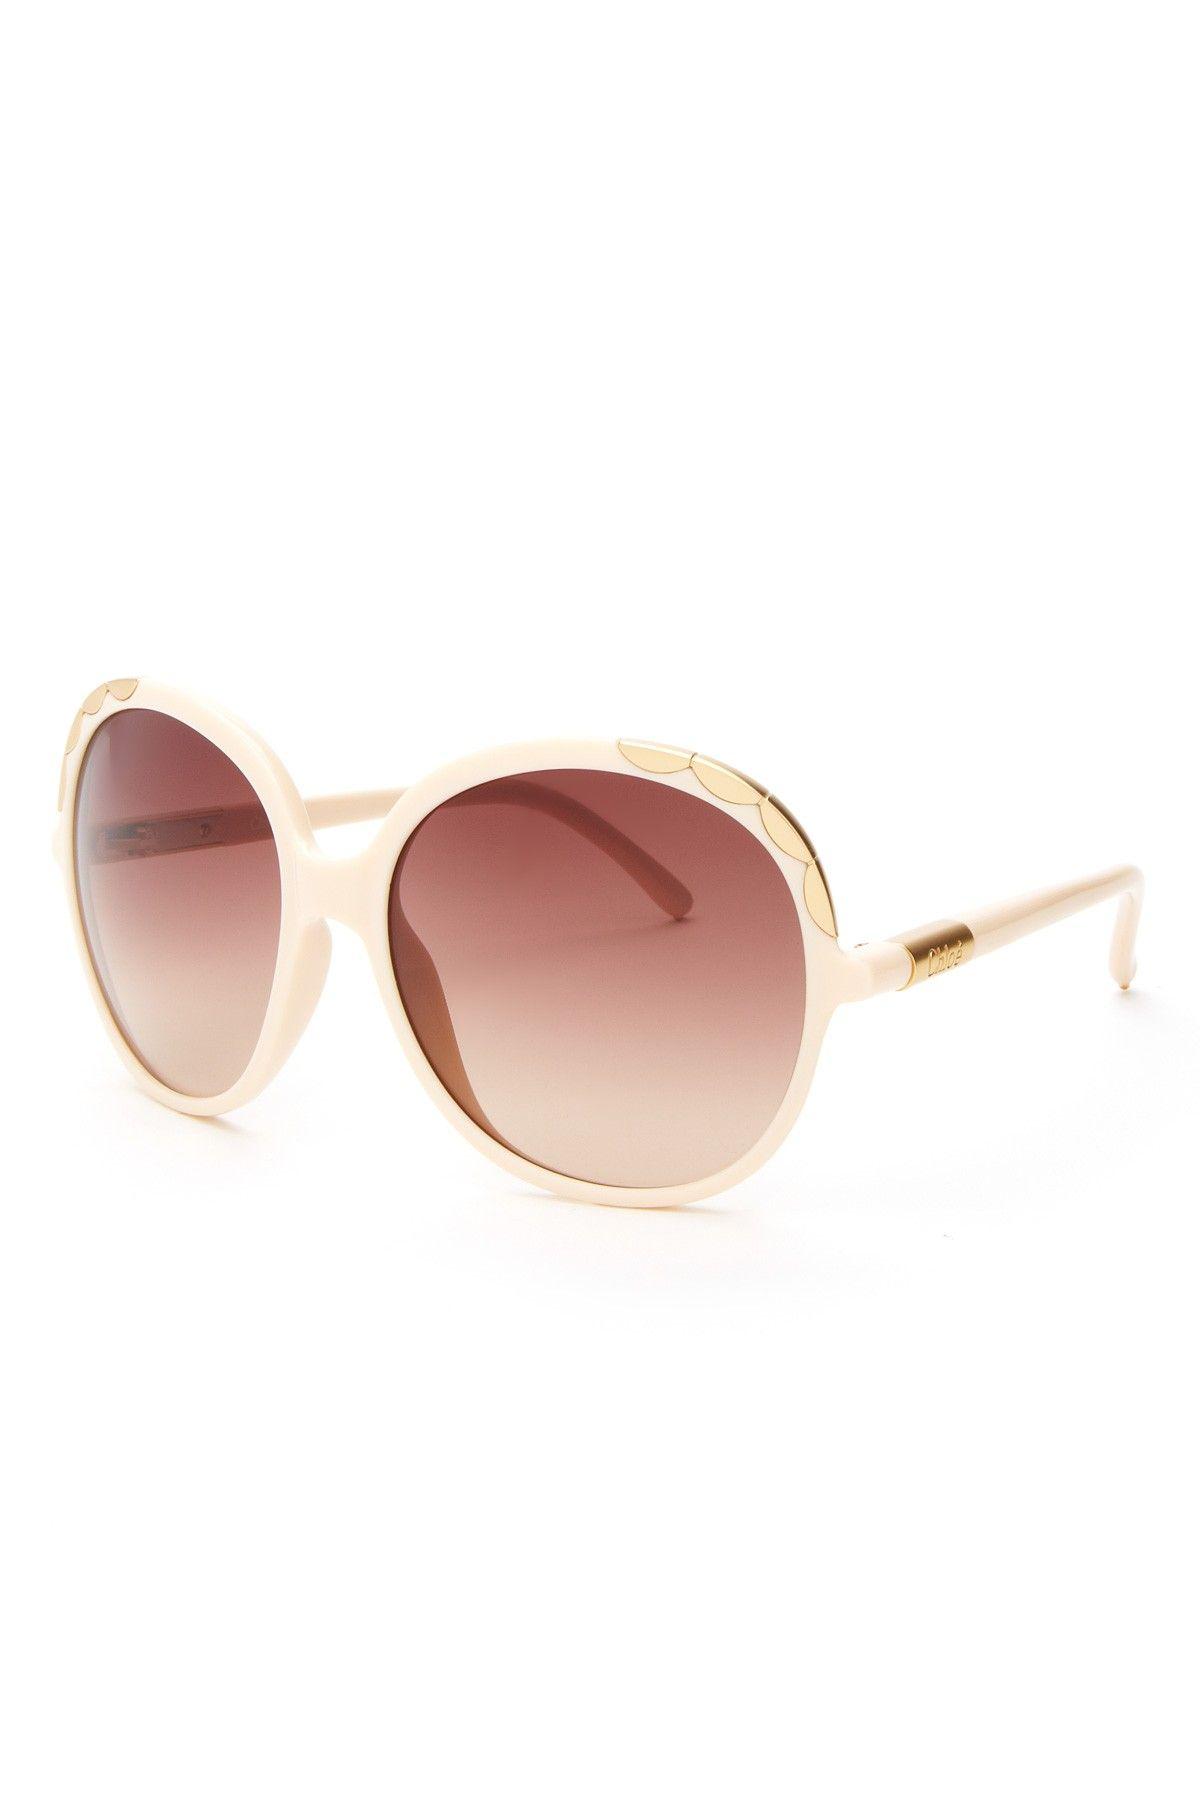 Chloe Women s Sunglasses Here comes the sun!   JÓIAS E BIJOUTERIAS ... ed090c1144